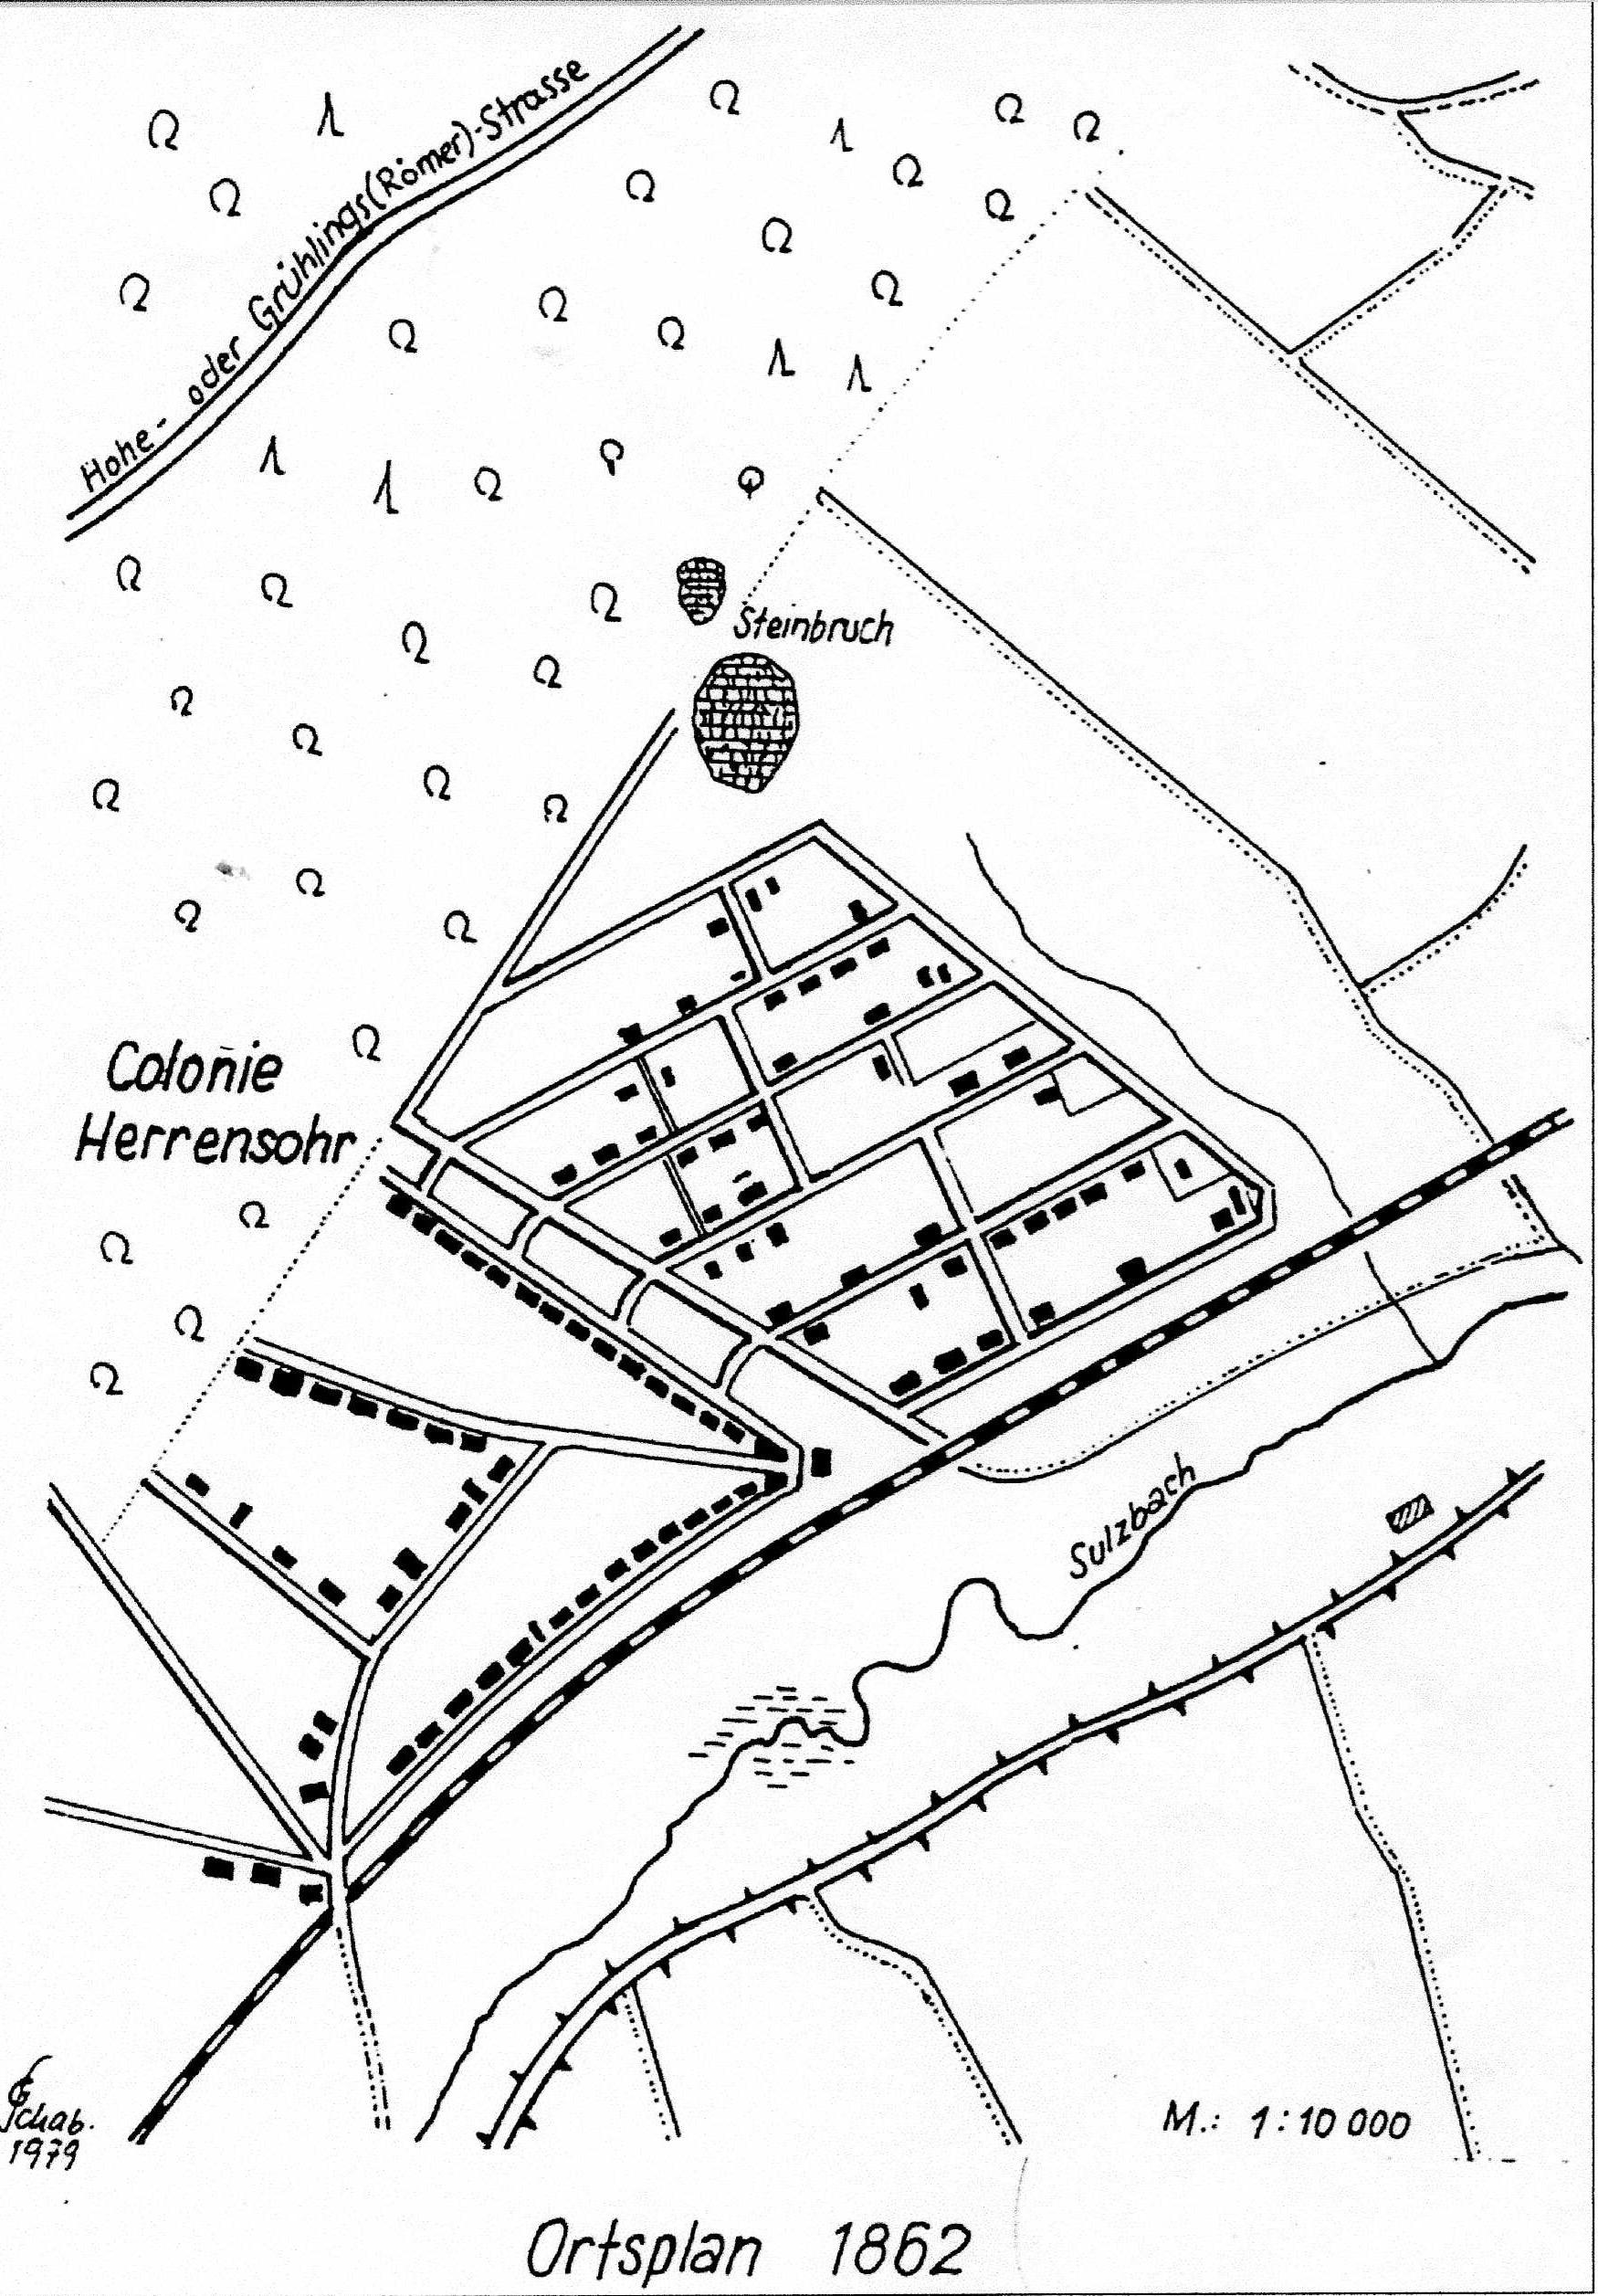 Doro Backes - Ortsplan 1862